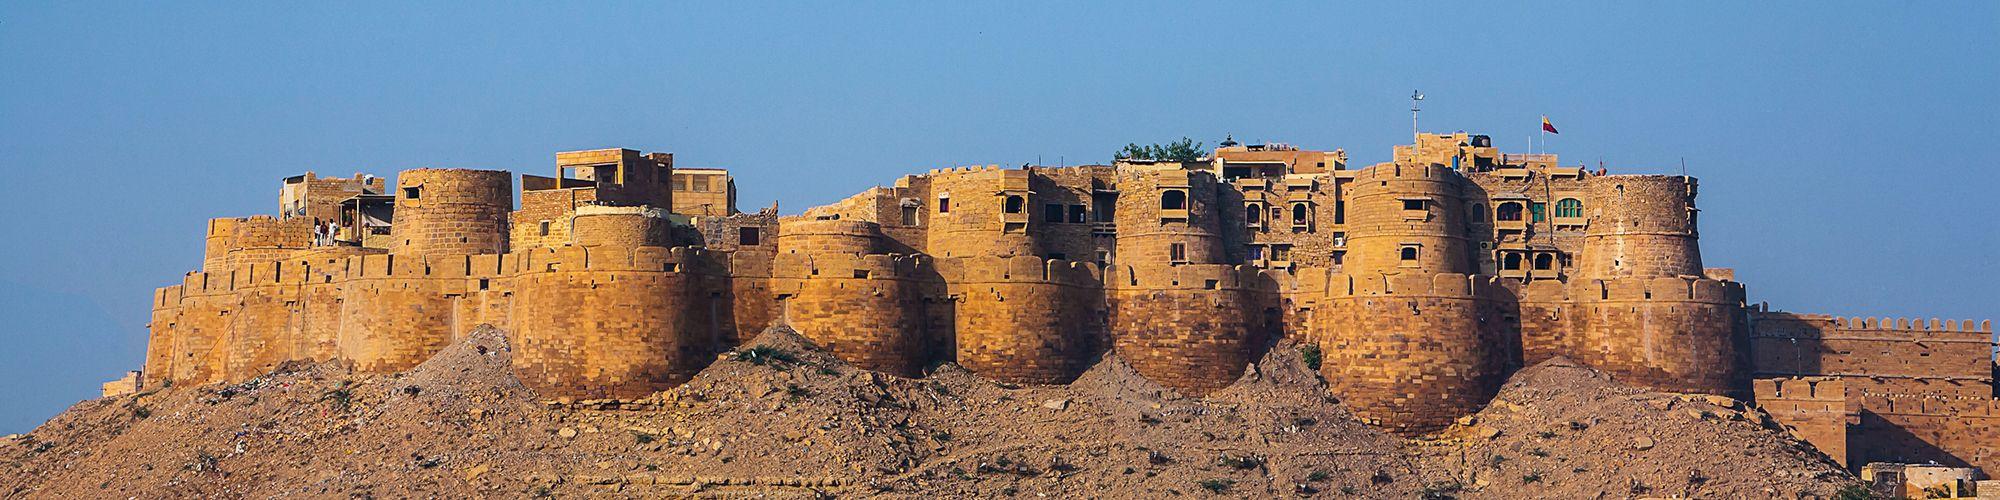 Fort, Jaisalmer, Rajasthan, India